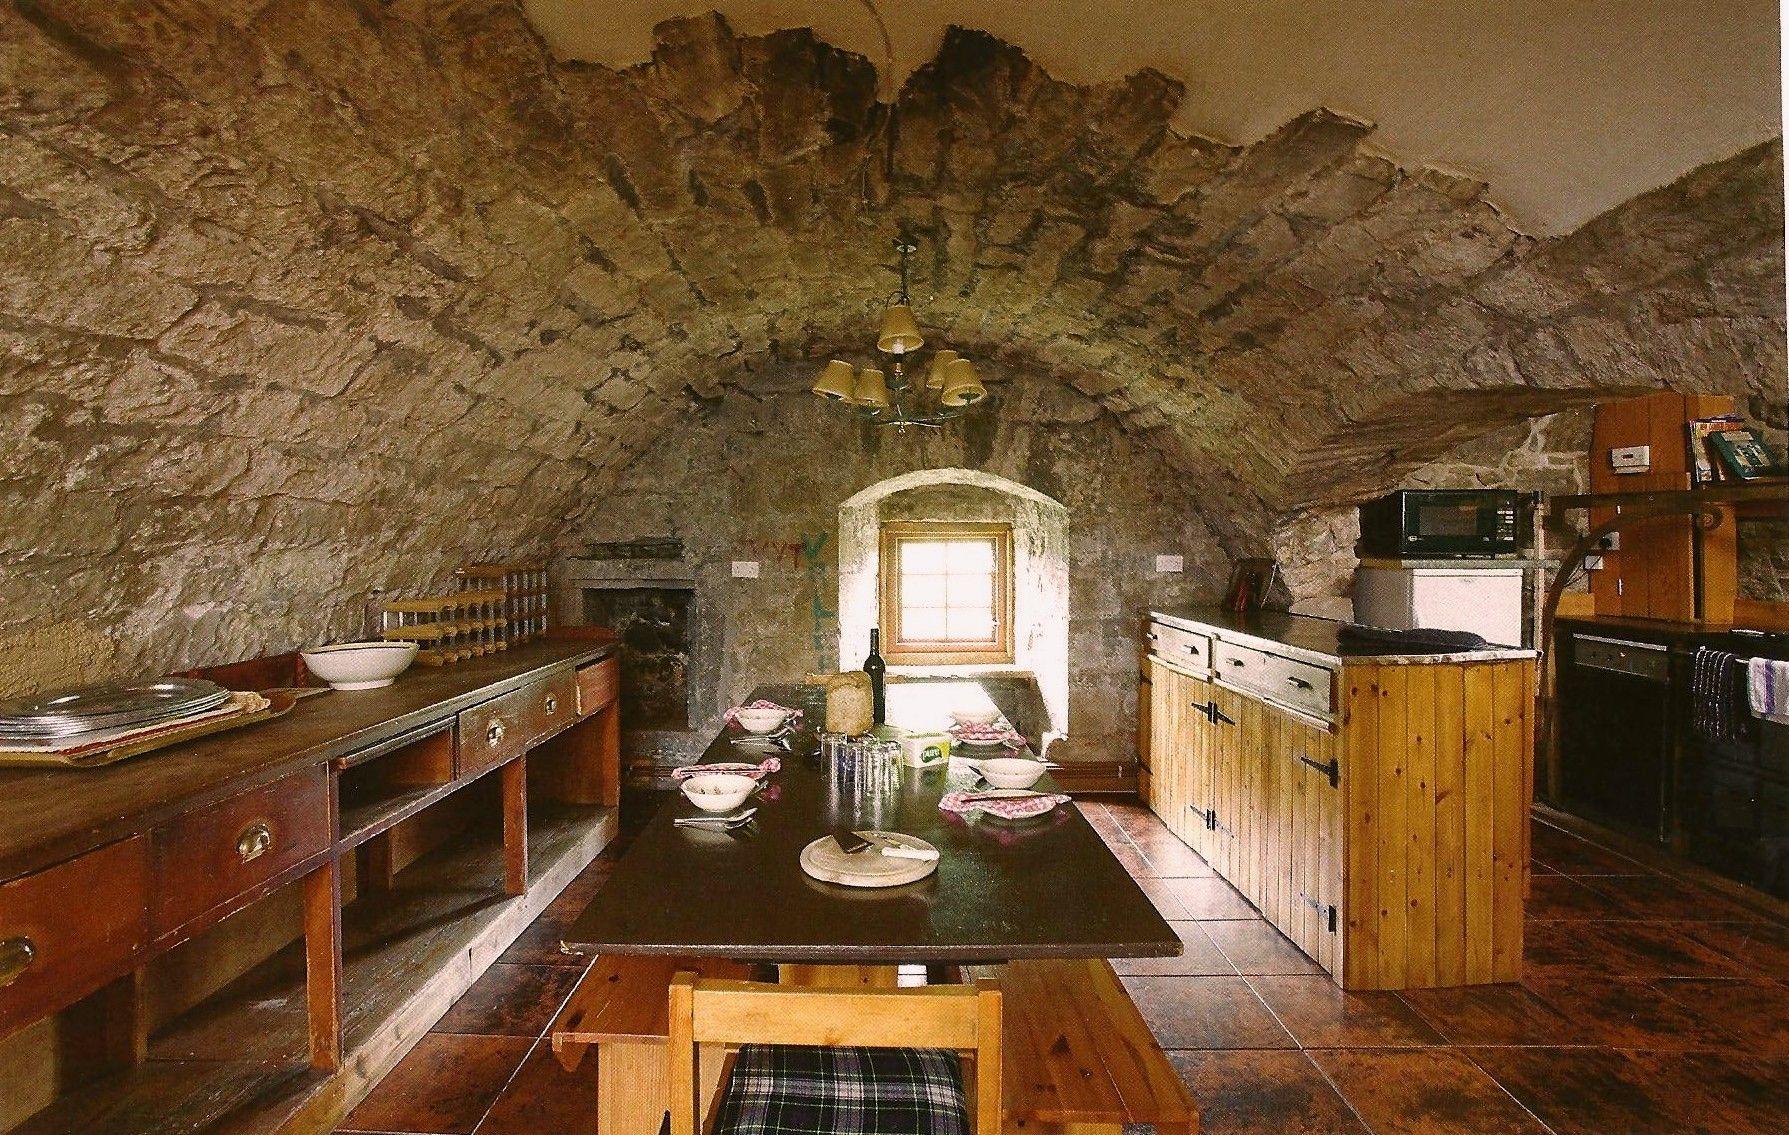 medieval castle kitchen #3 - medieval manor kitchen plane-castle